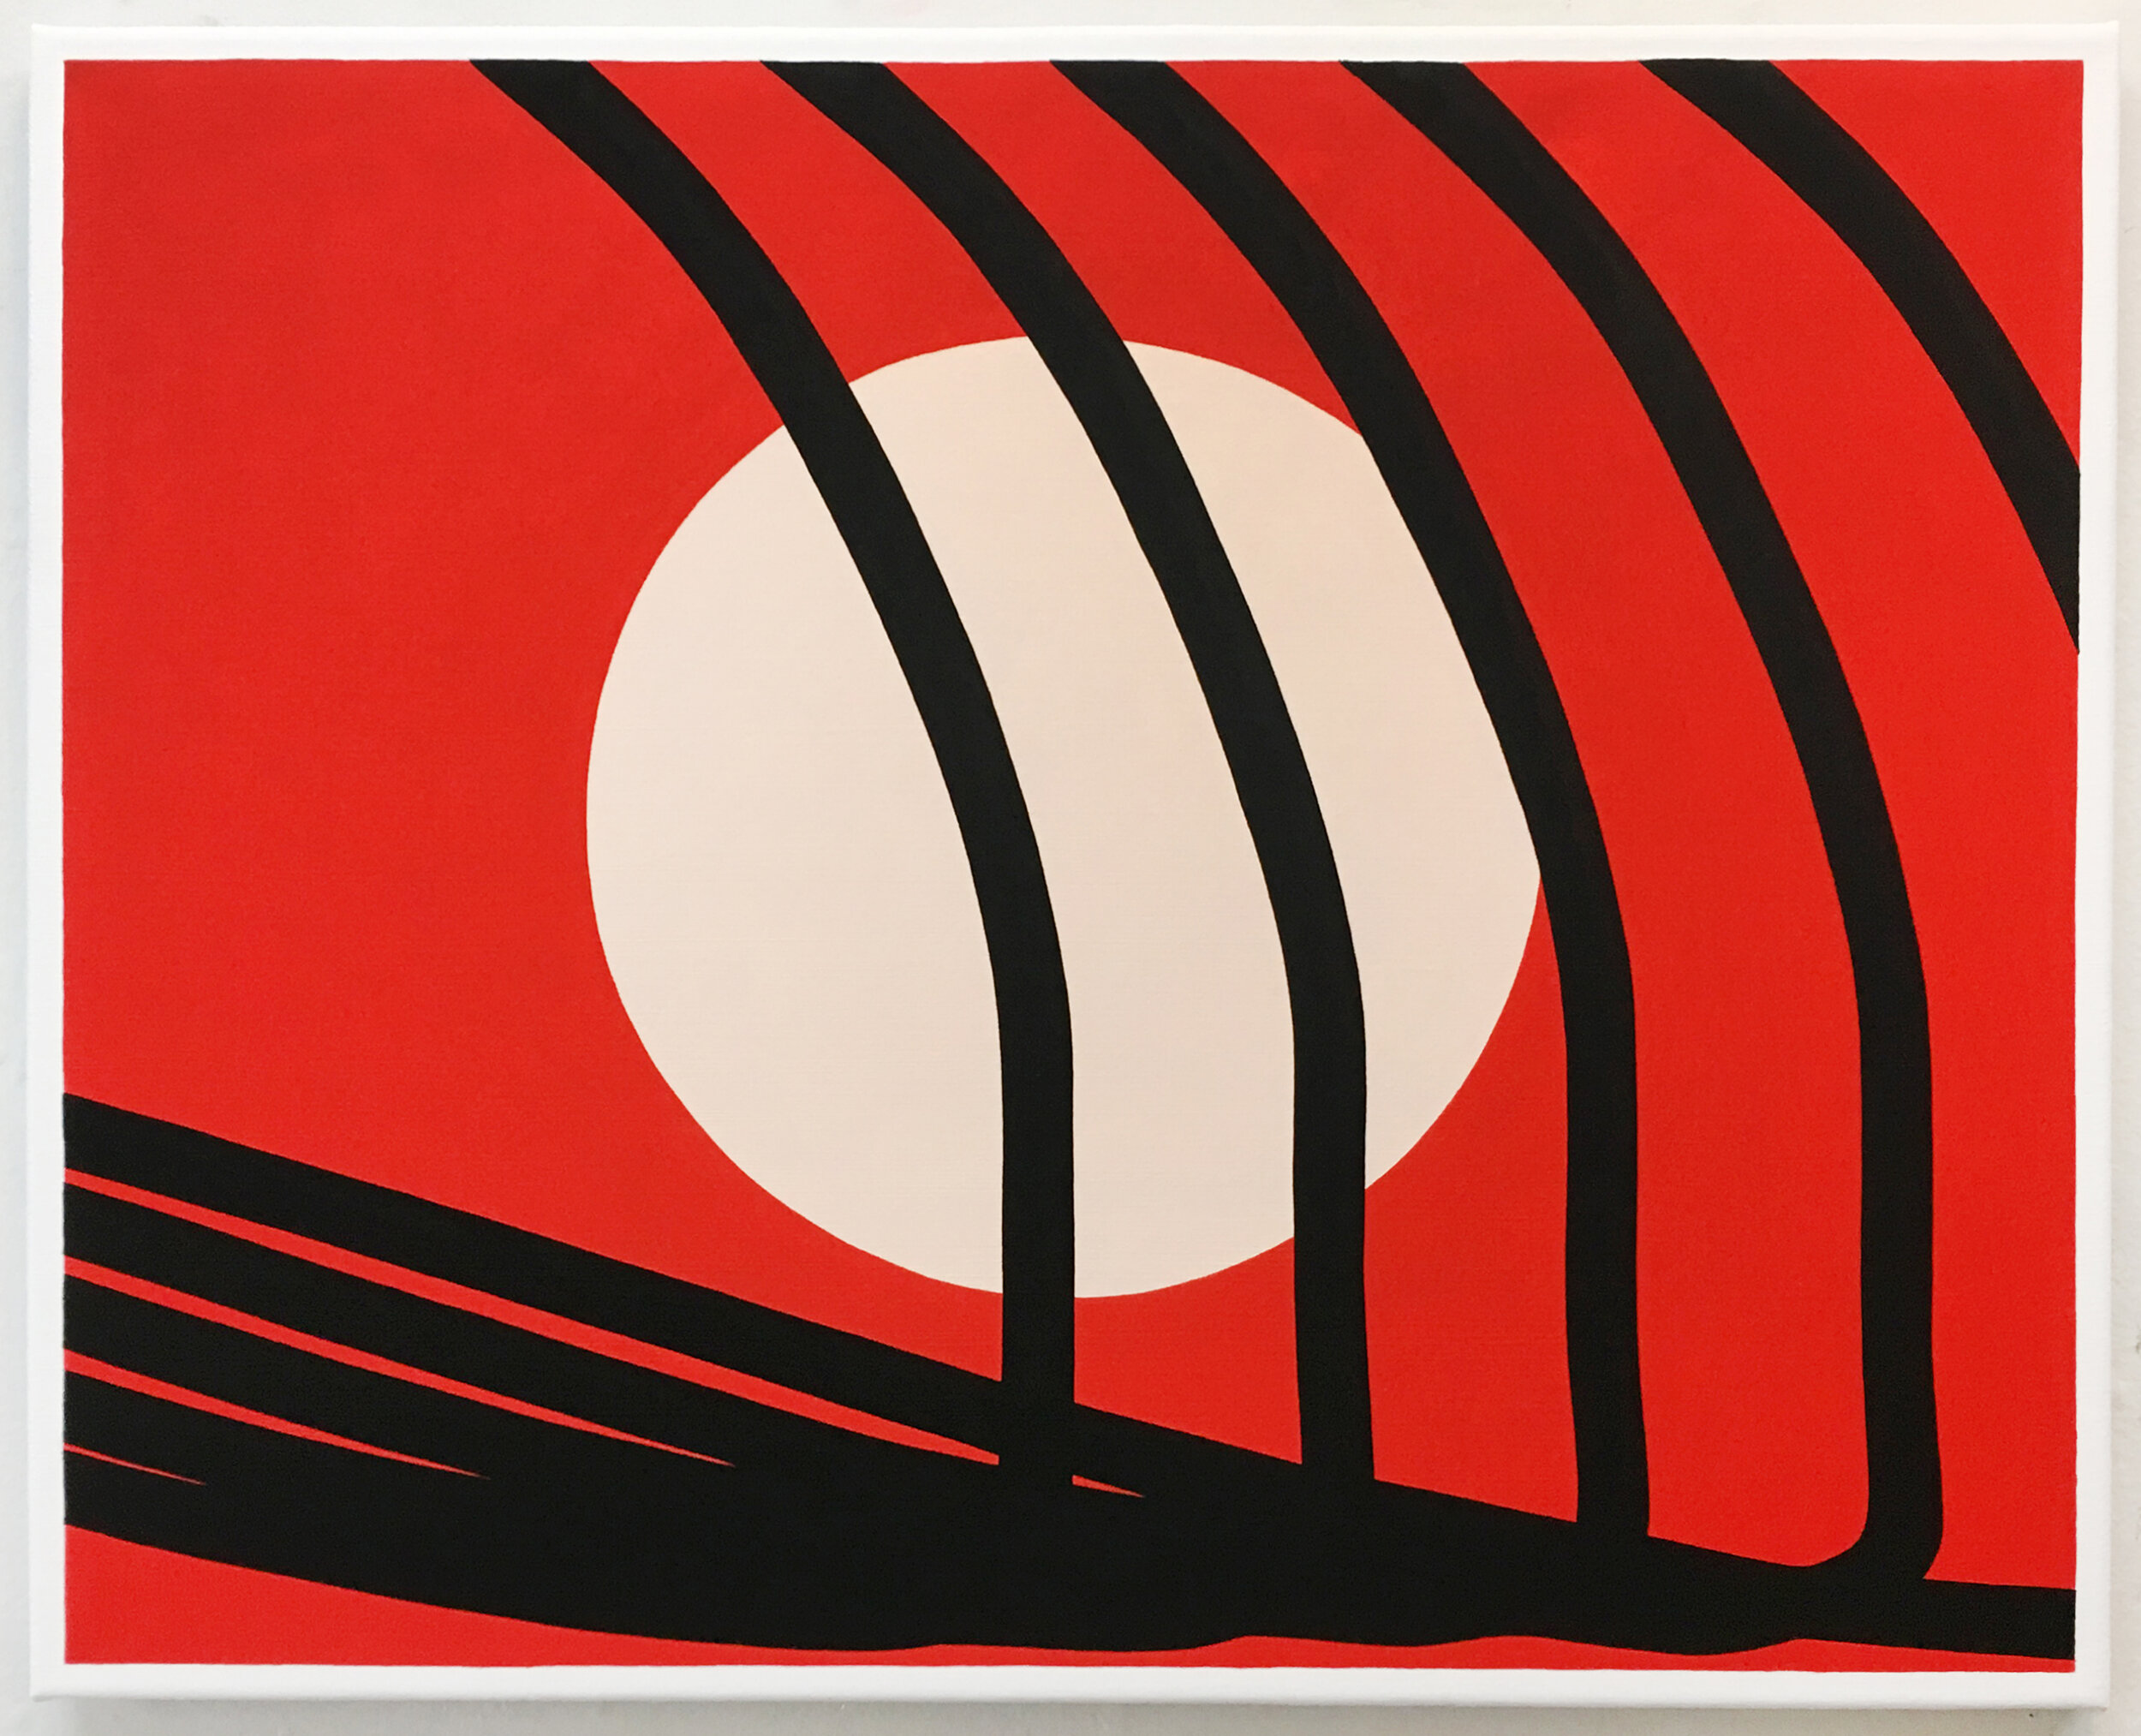 red-canvas-24x30-10.jpg